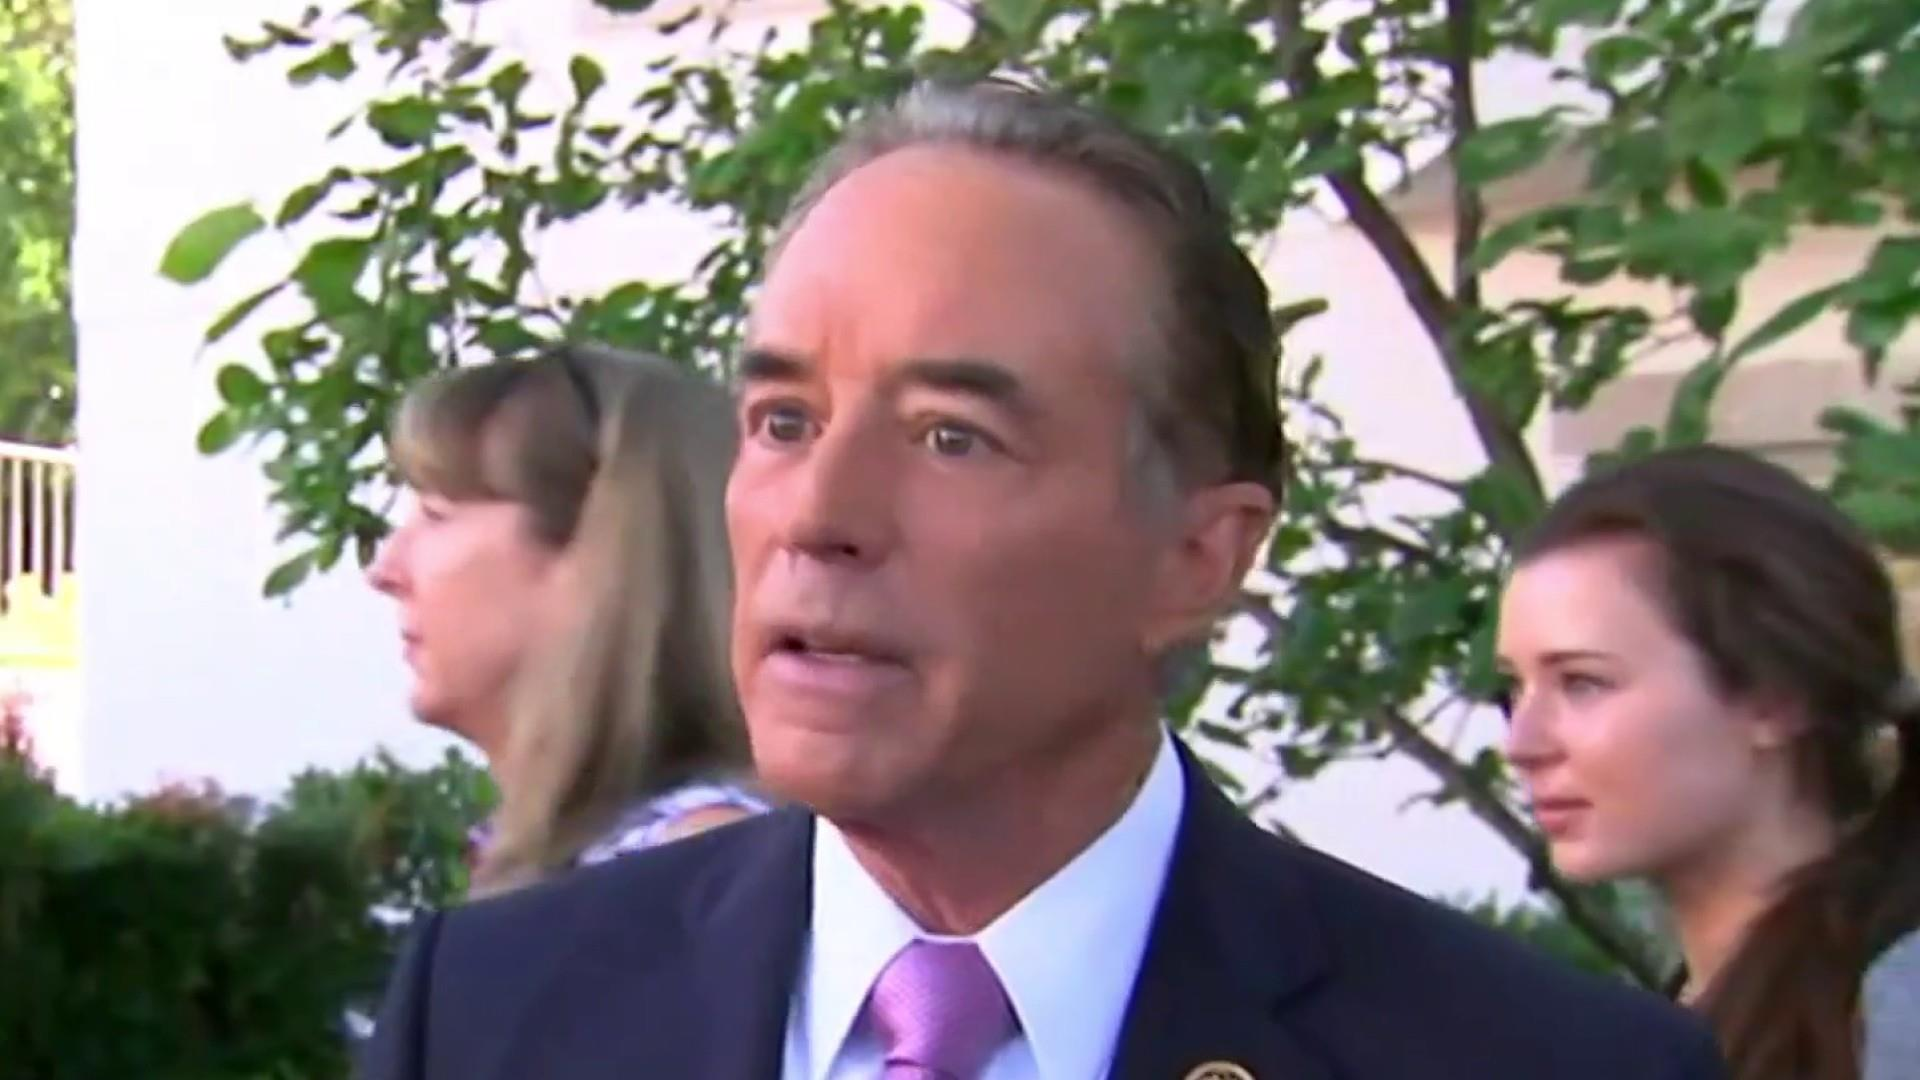 Rep. Collins backtracks, will suspend re-election campaign